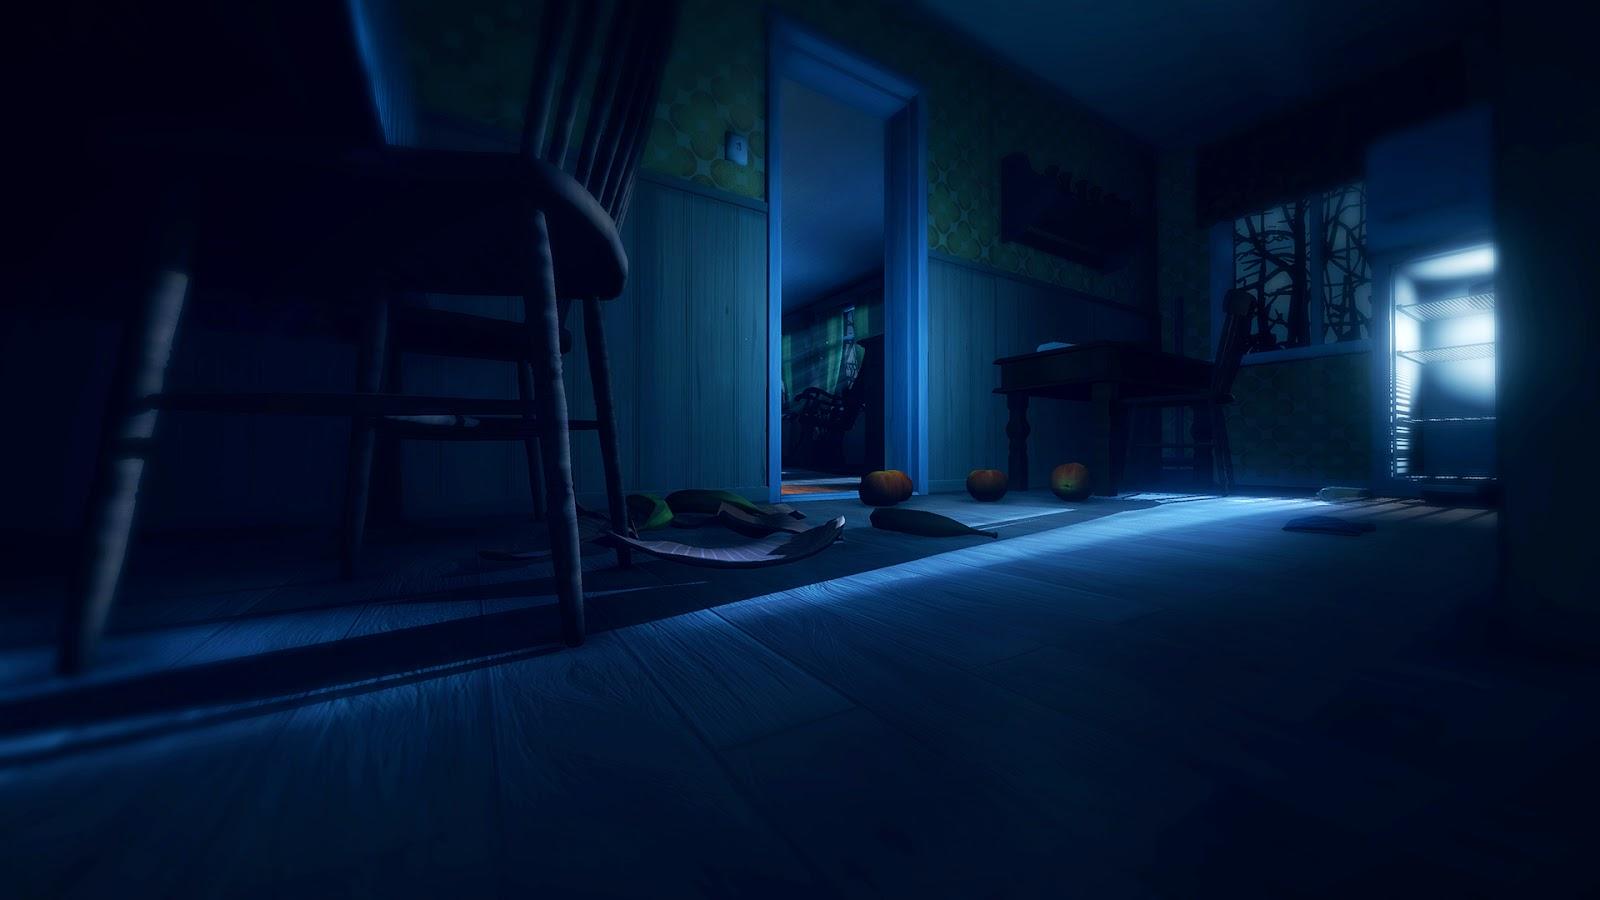 Among the sleep screenshot dark doorway in house